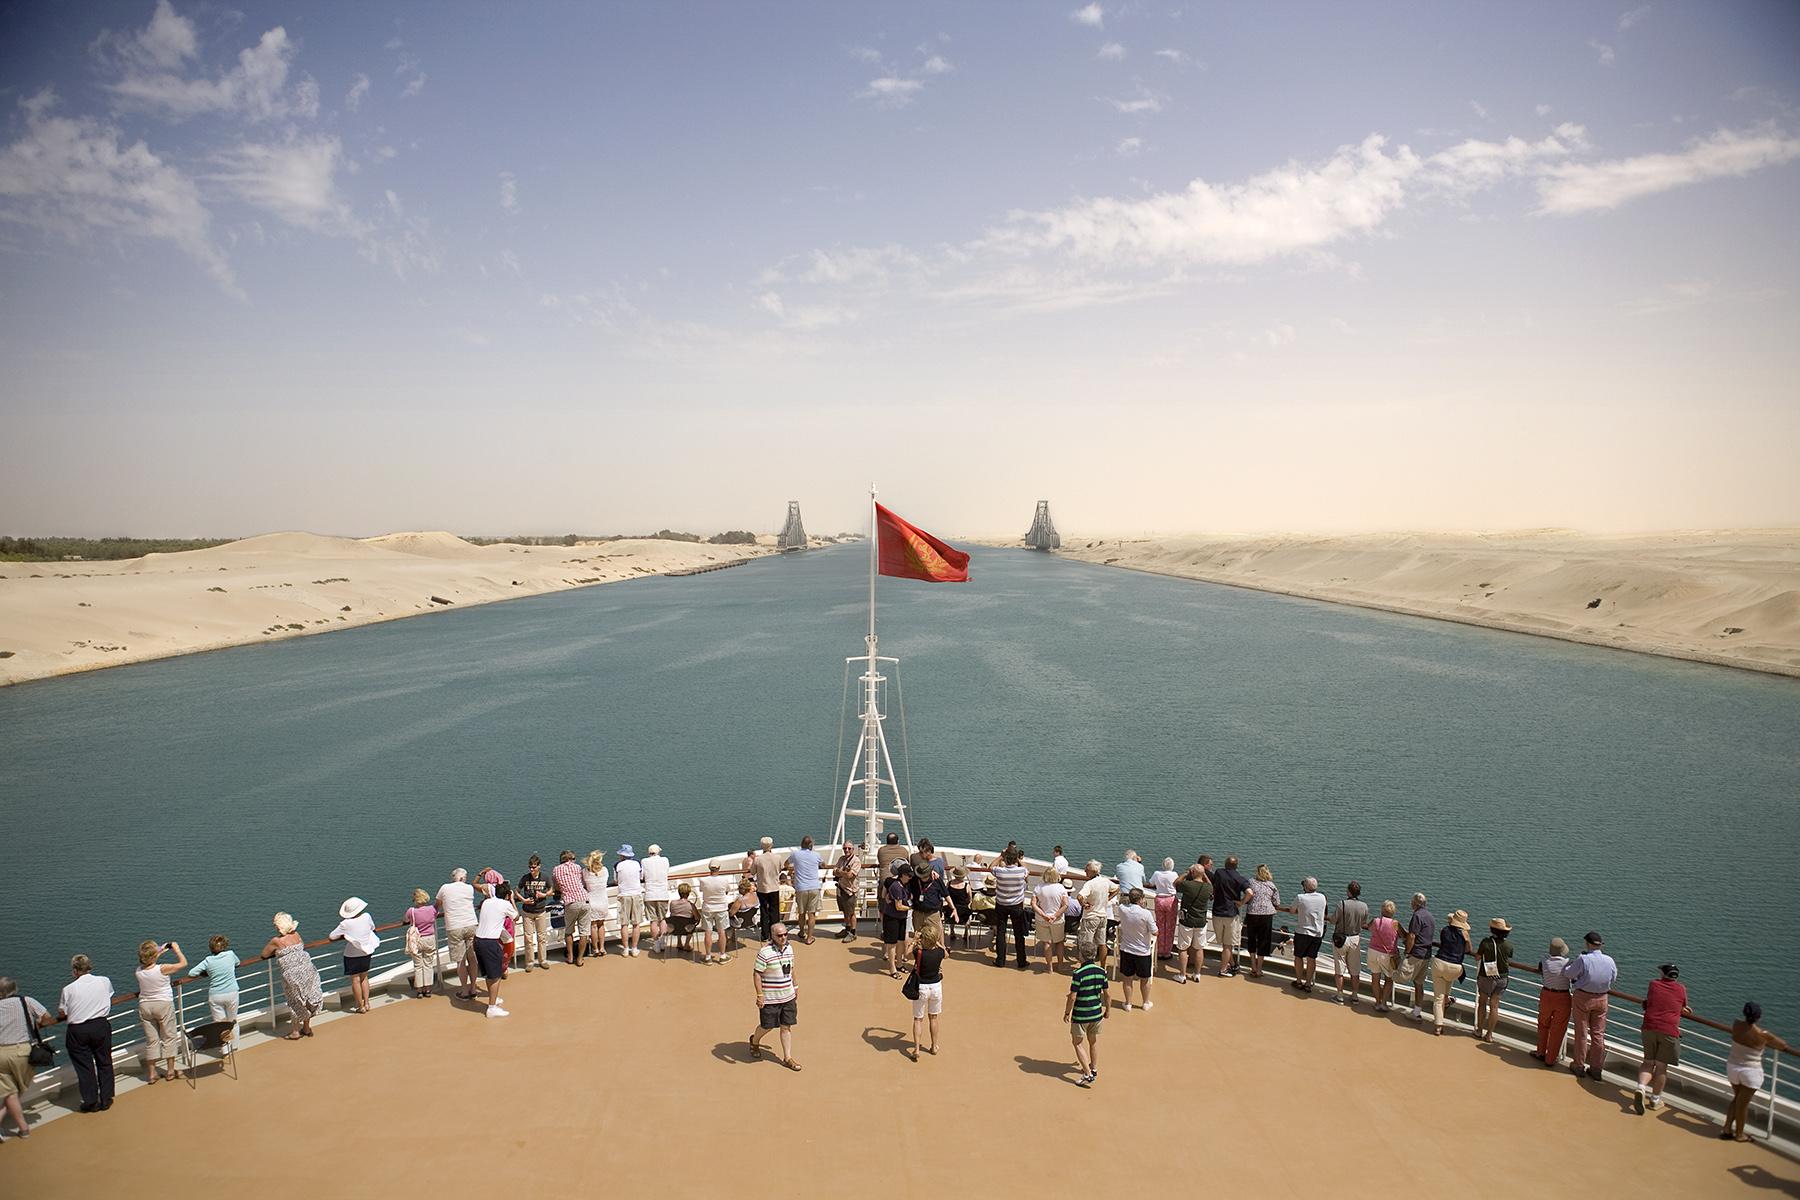 Suez Canal, Egypt. 2012